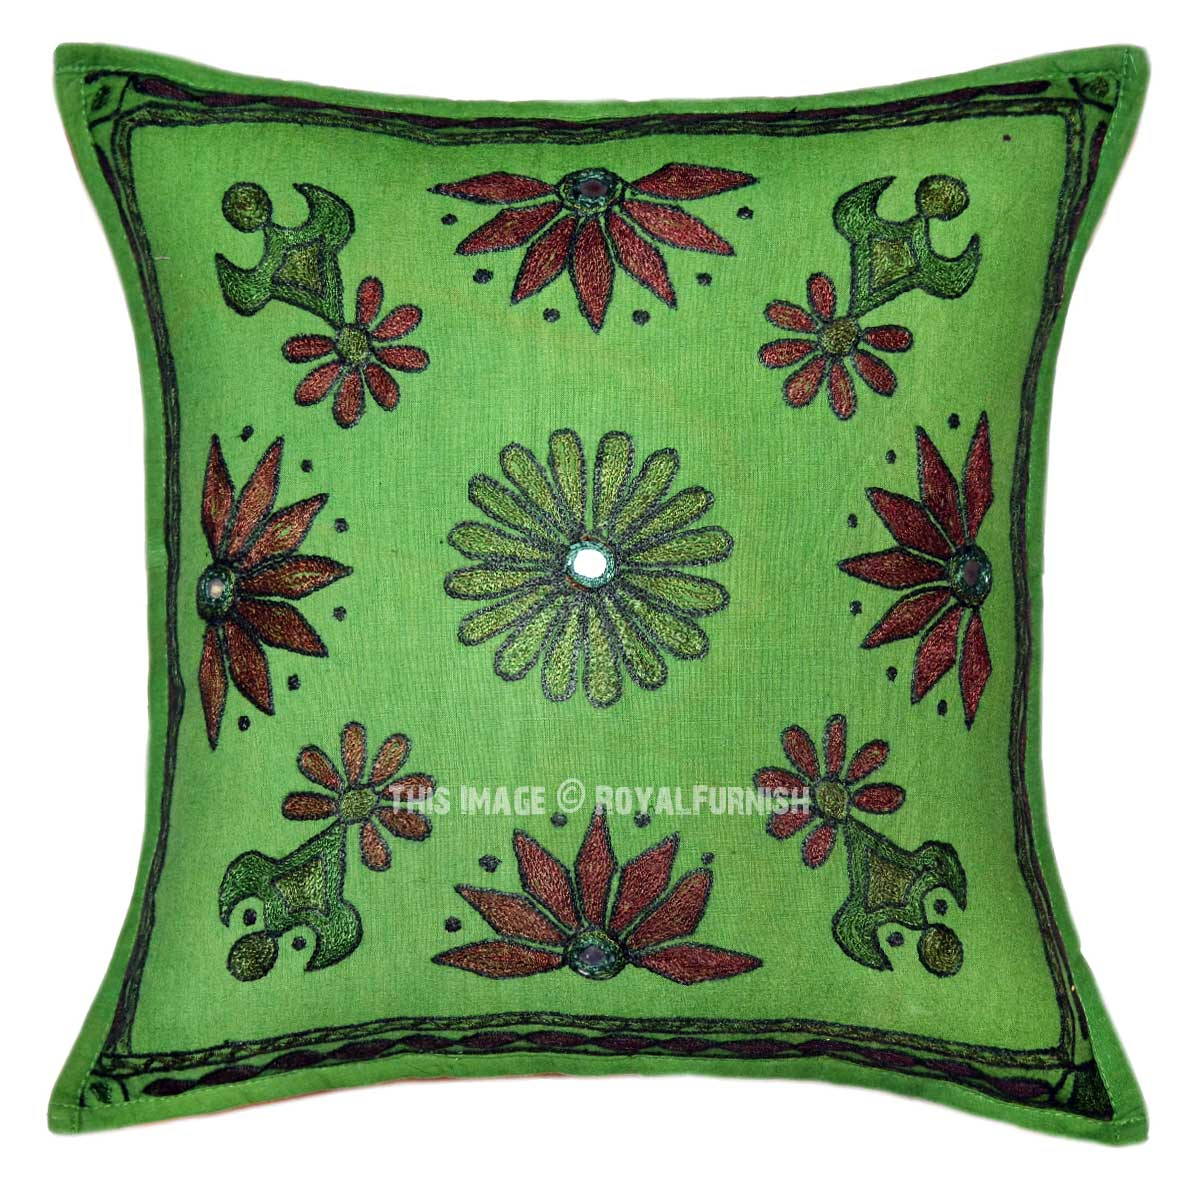 Green Decorative Folk Embroidered Boho Throw Pillow Sham 16X16 - RoyalFurnish.com